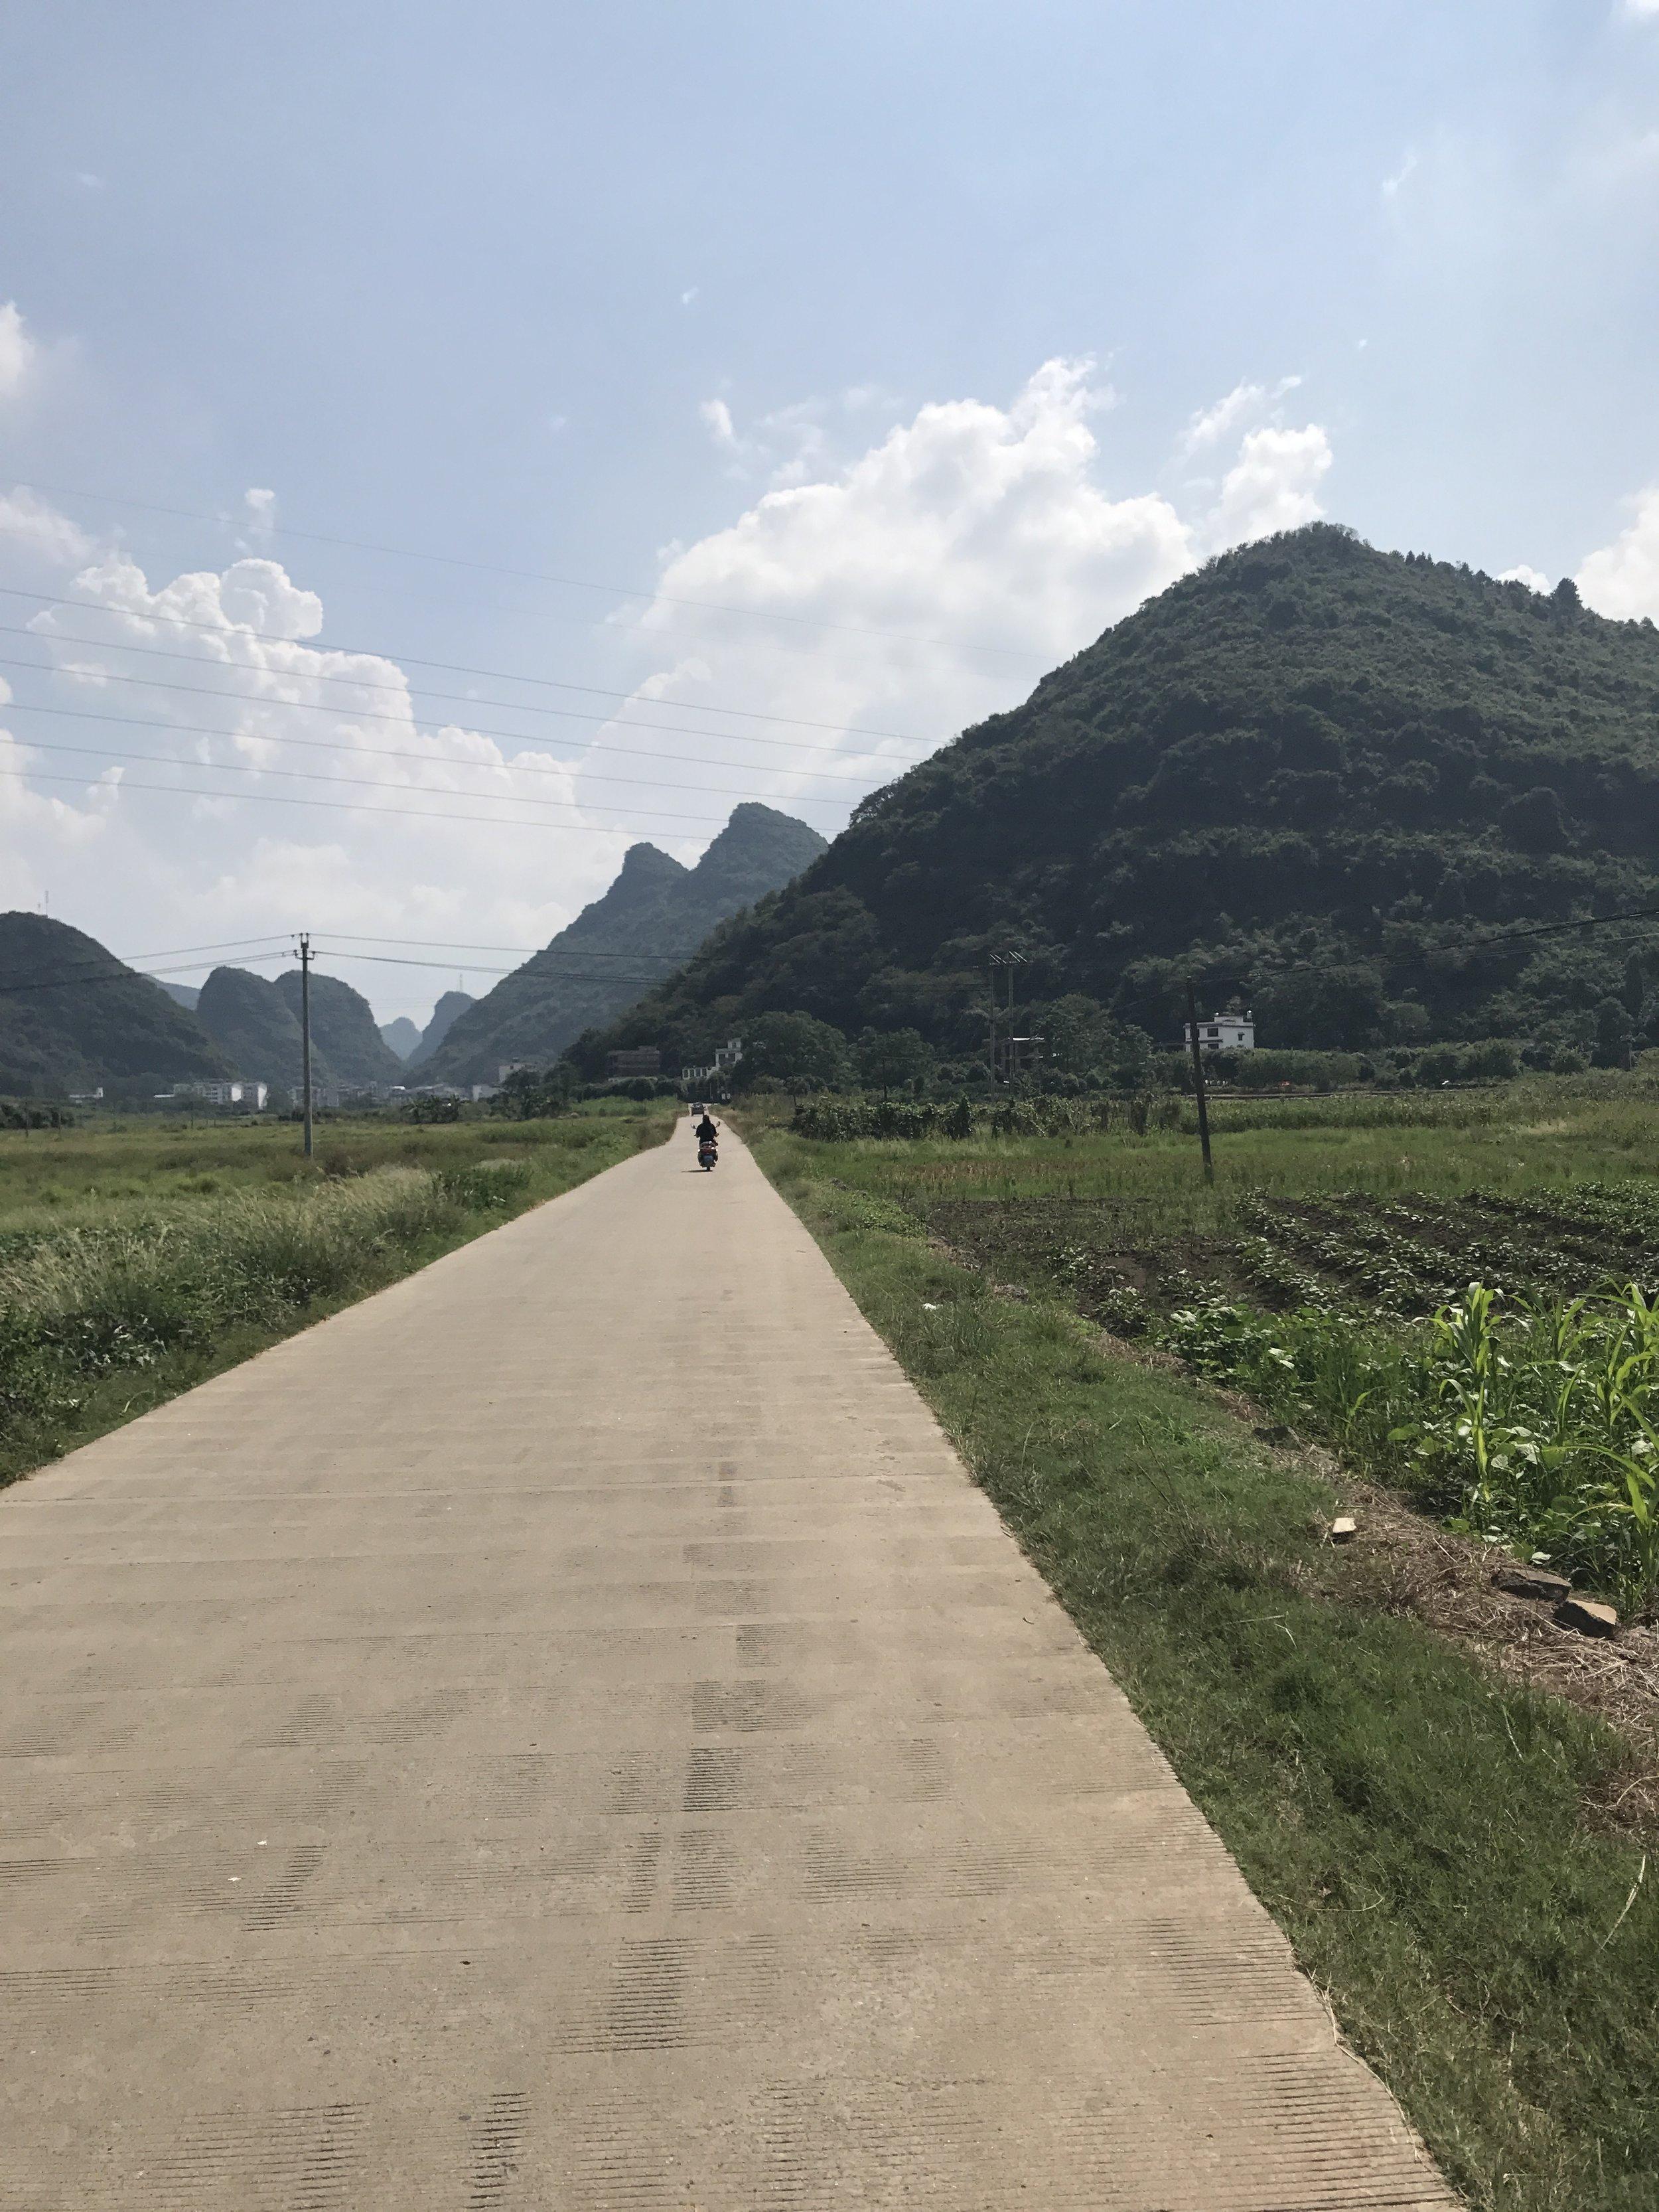 wandering the back roads of Yangshuo, China